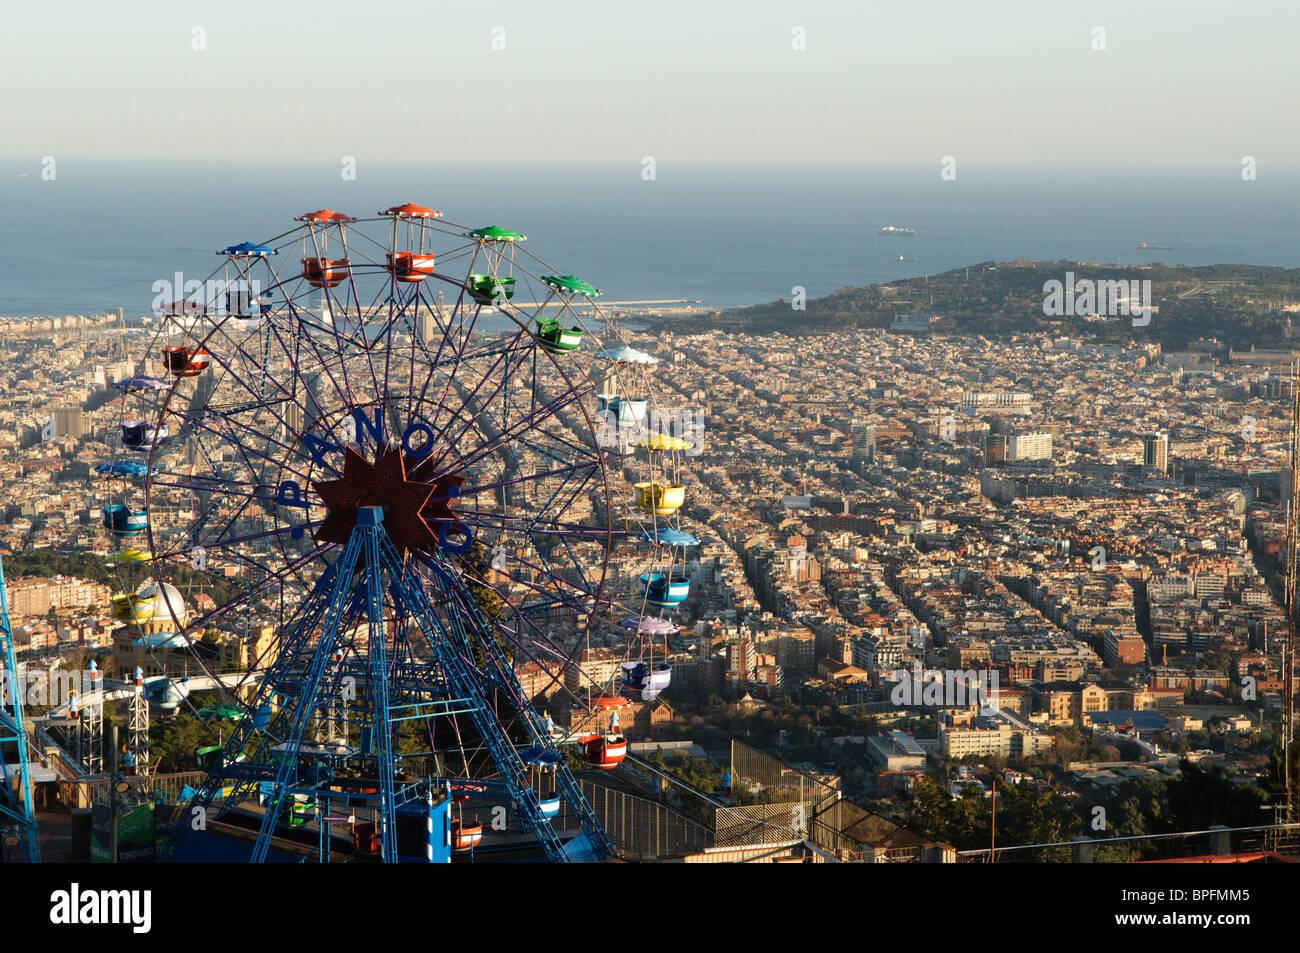 Ferris Wheel in Tibidabo amusement park, Montjuic, Barcelona, Spain - Stock Image